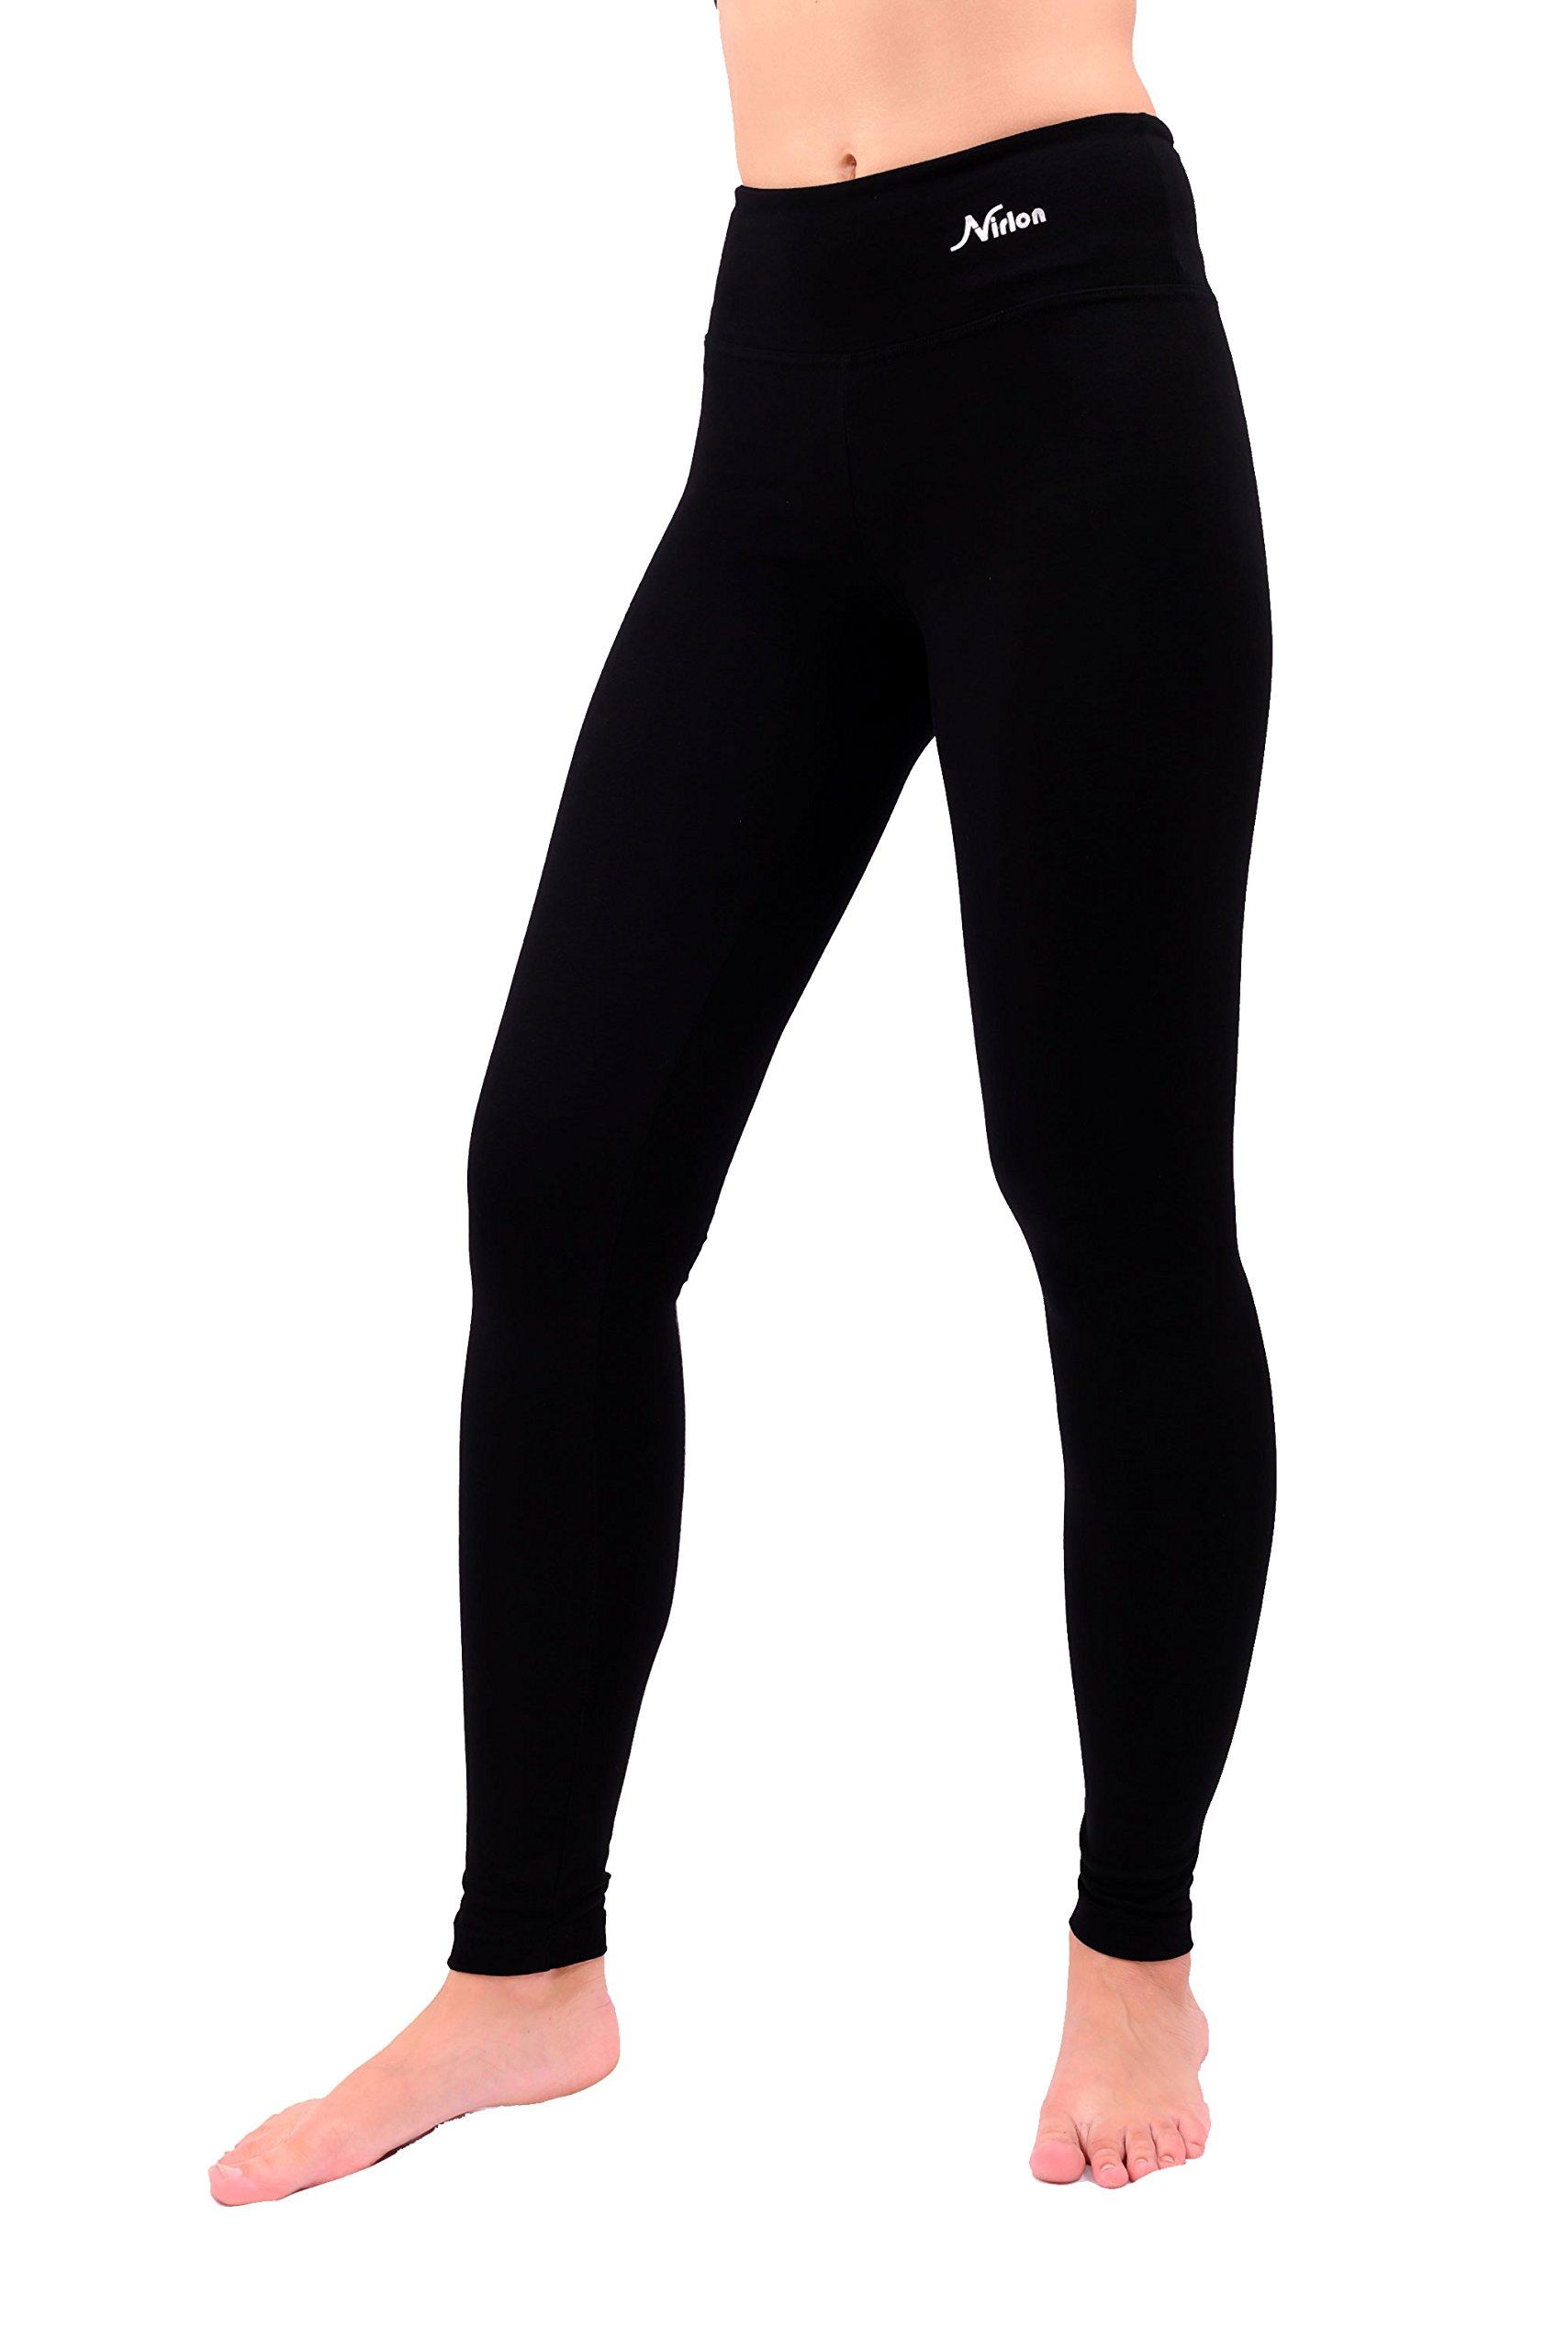 Nirlon Yoga Pants For Women Best Black Leggings 28'' Inseam Length Regular & Plus Size (XL, Black)